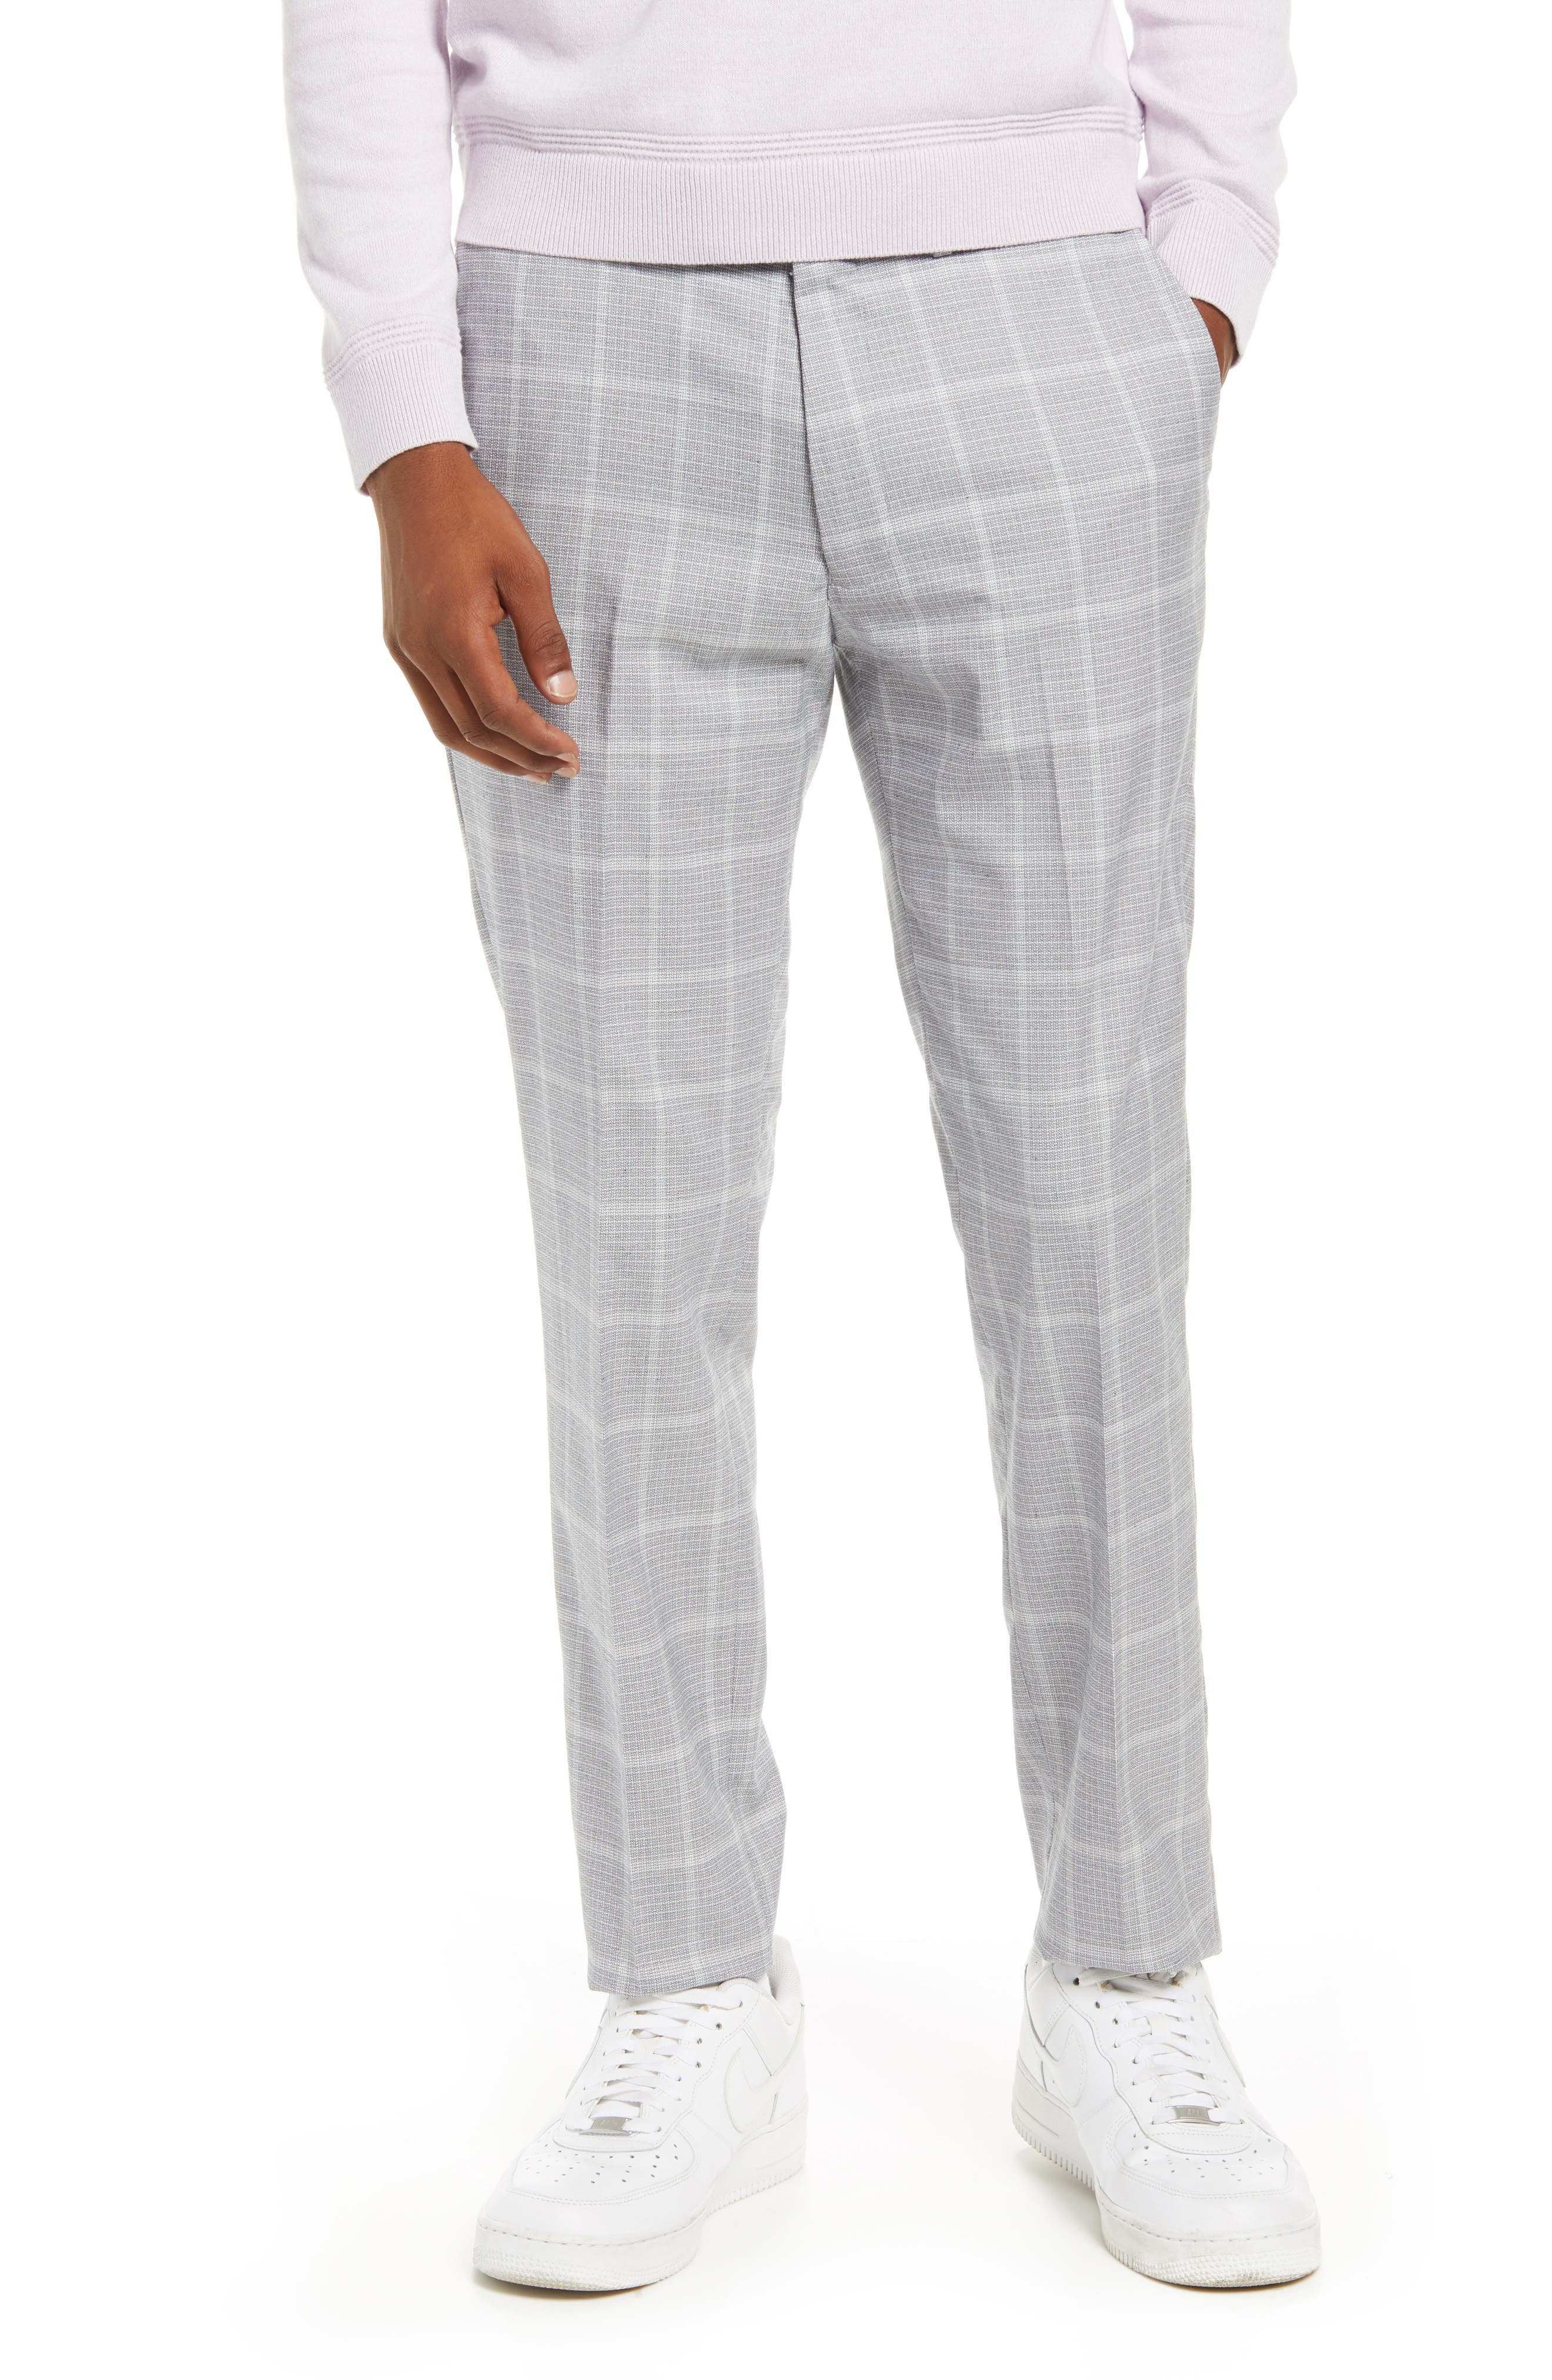 60s – 70s Mens Bell Bottom Jeans, Flares, Disco Pants Mens Topman Skinny Fit Flat Front Check Mens Pants Size 34 x 32 - Grey $65.00 AT vintagedancer.com